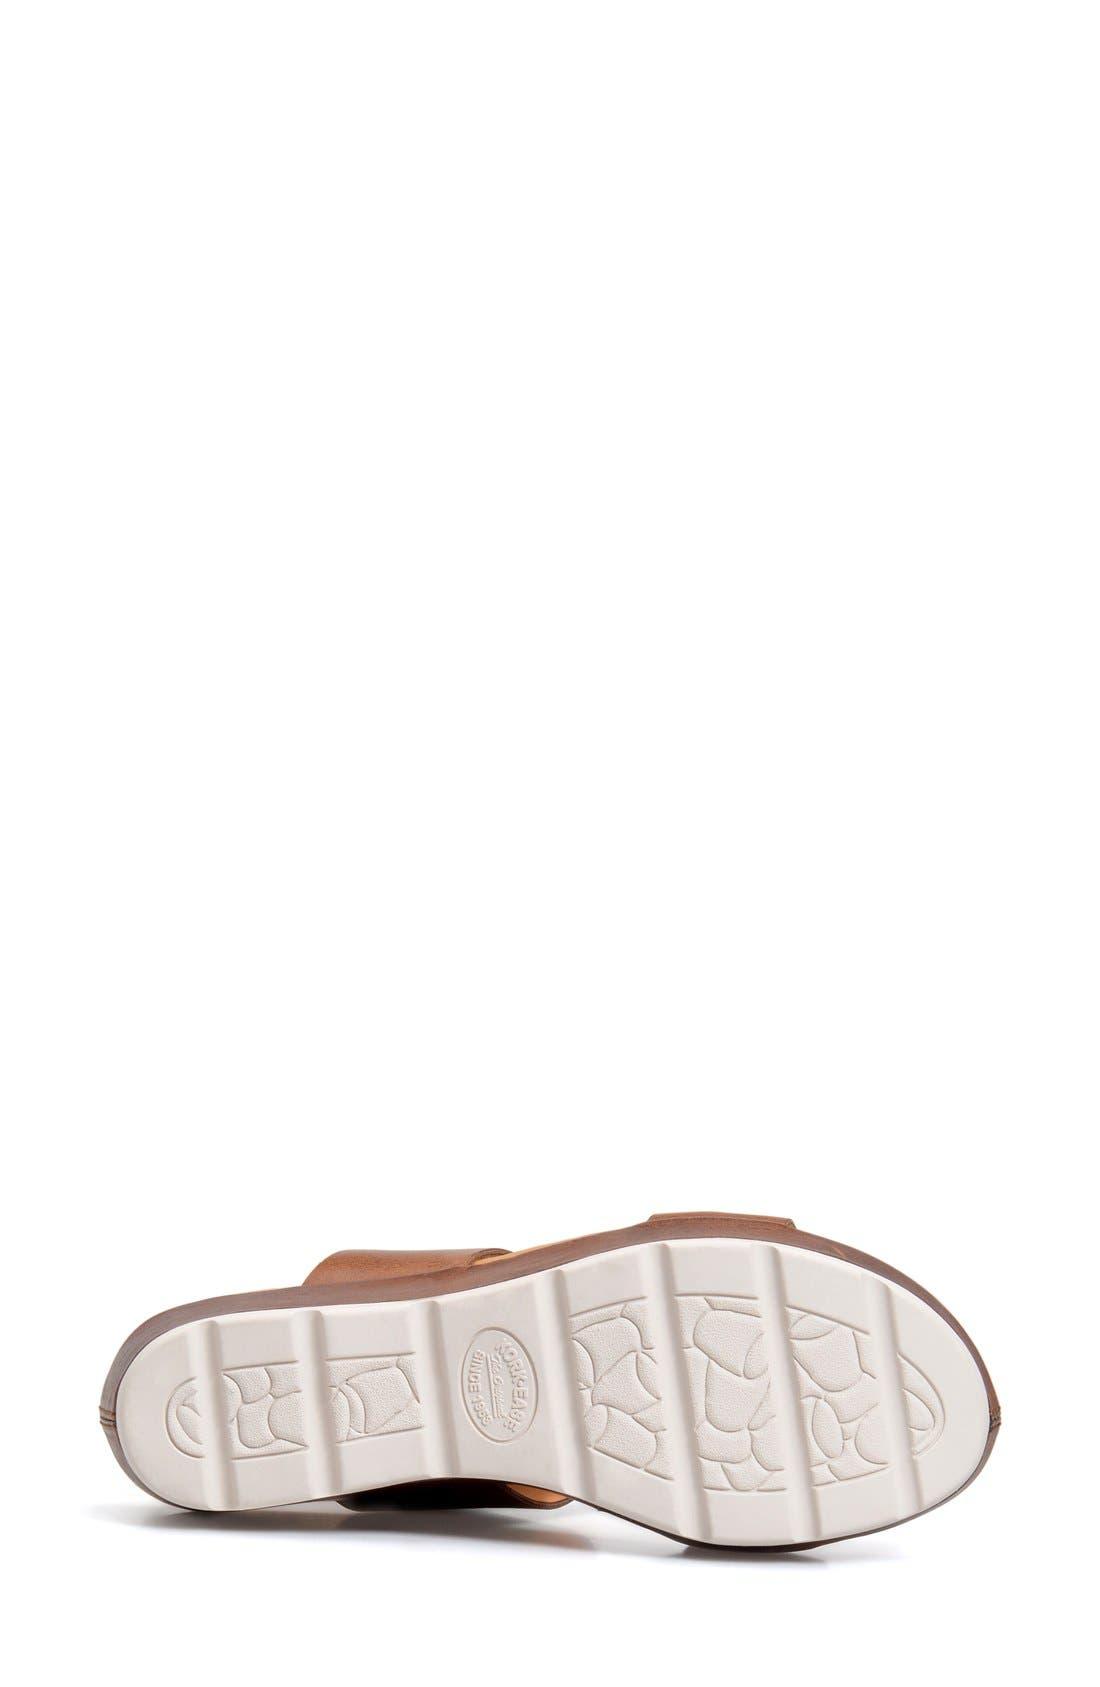 'Khloe' Platform Wedge Sandal,                             Alternate thumbnail 17, color,